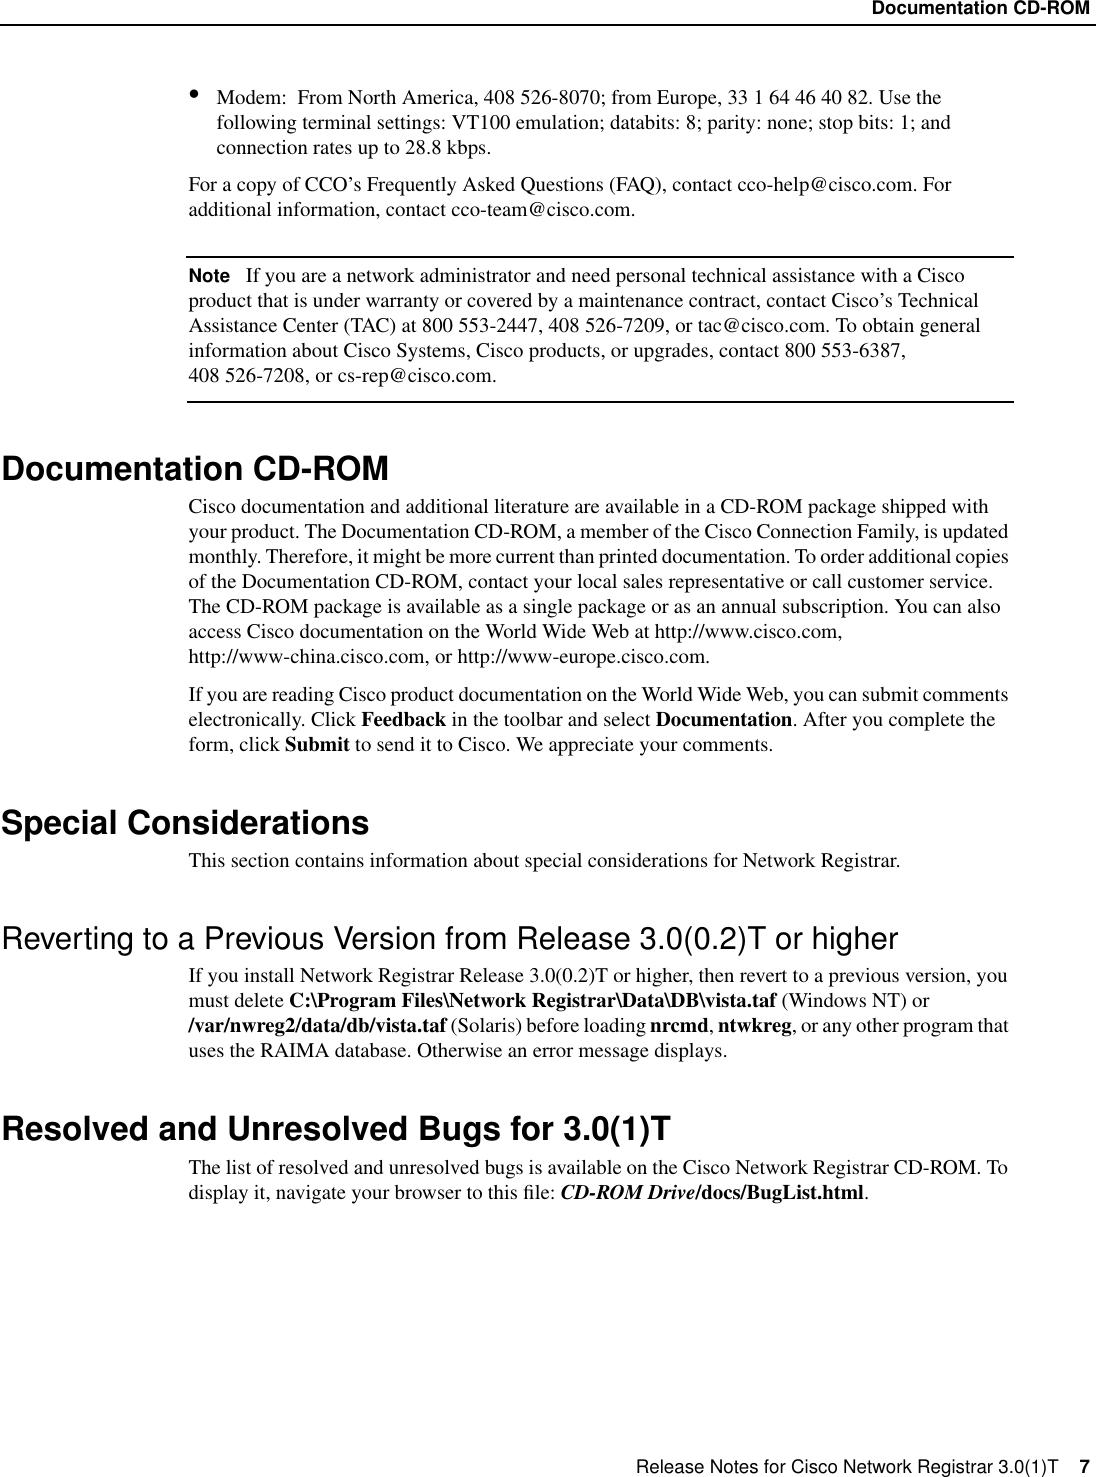 Cisco Systems Registrar 3 01 Users Manual Nrrn30t